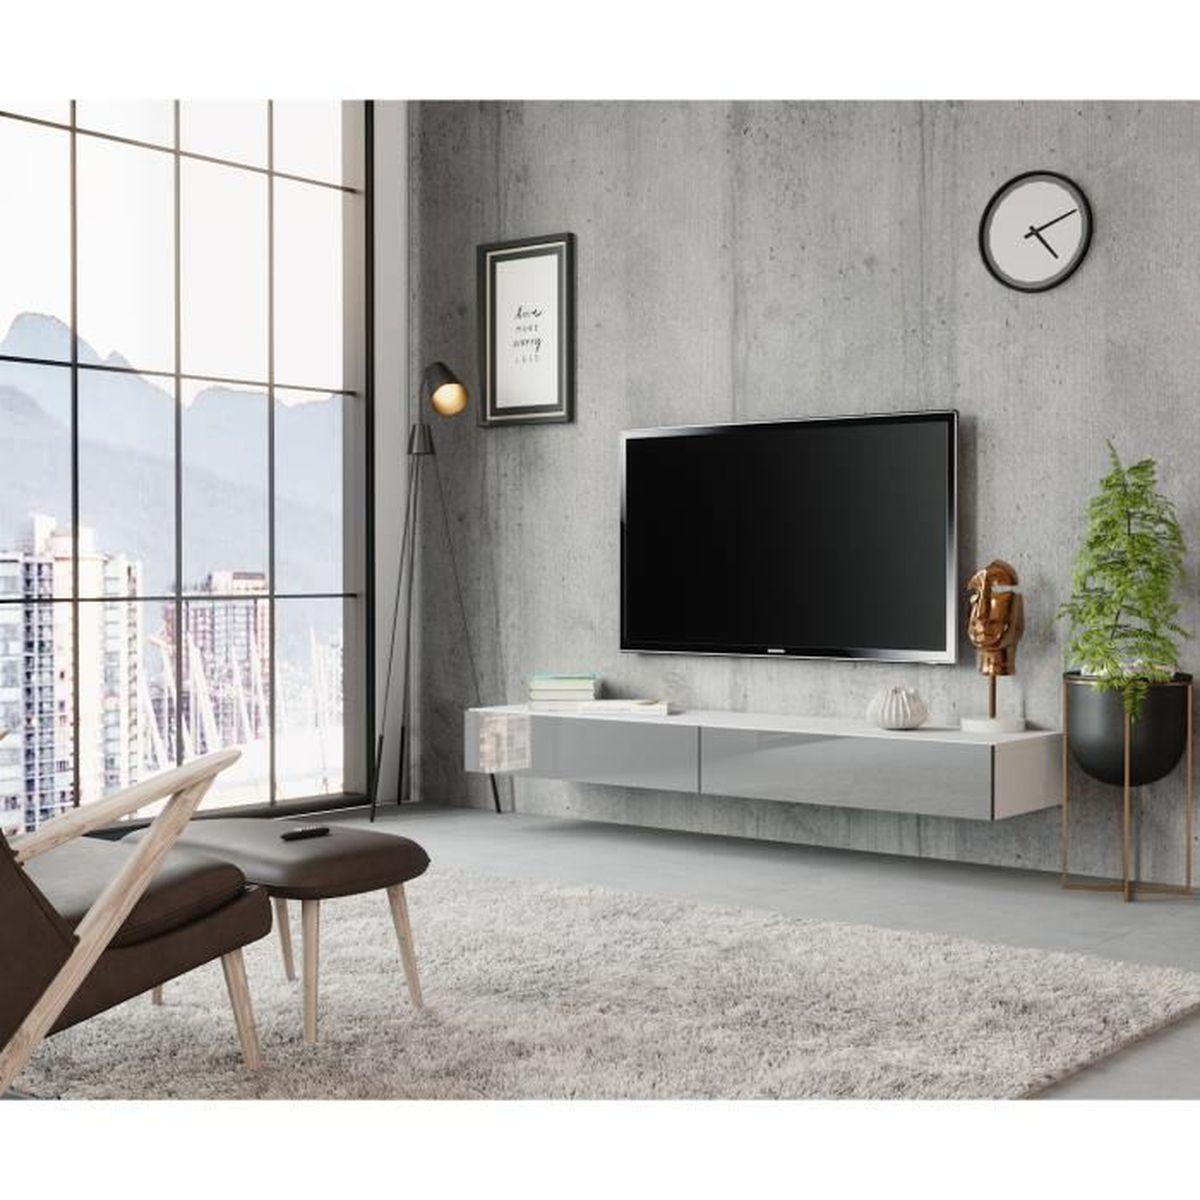 Difference Blanc Brillant Et Blanc Laqué meuble suspendu blanc laque